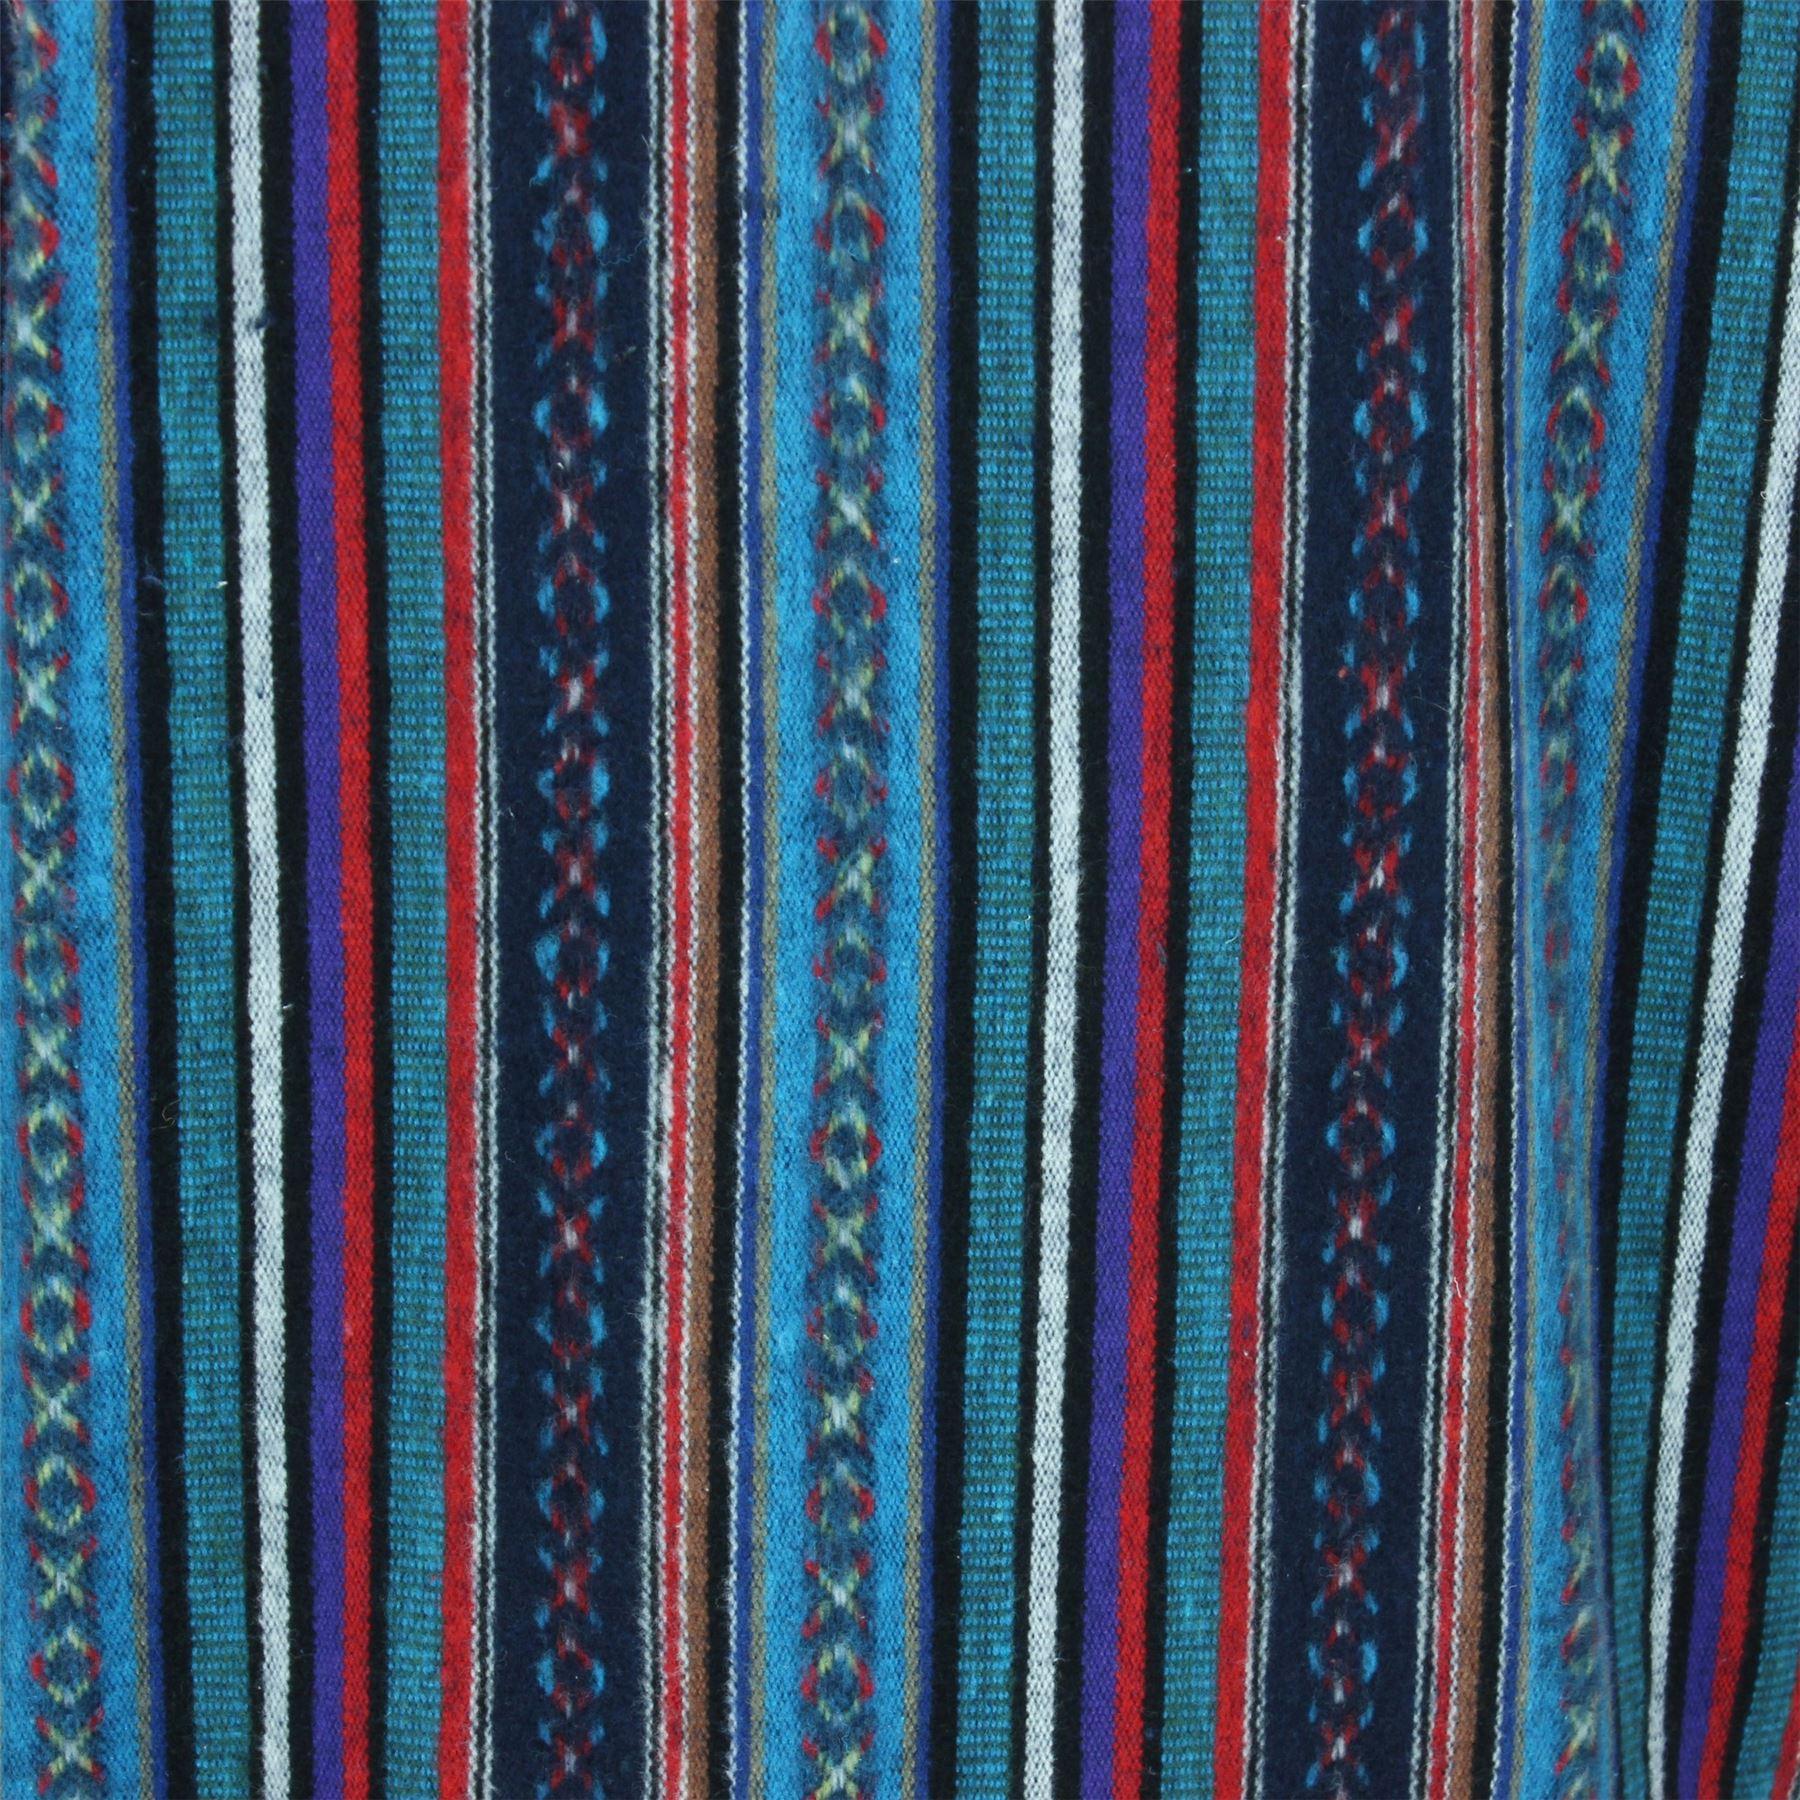 Hoodie Jumper LoudElephant Hoody Hippie Rainbow Cardigan Jacket Fleece Zipped